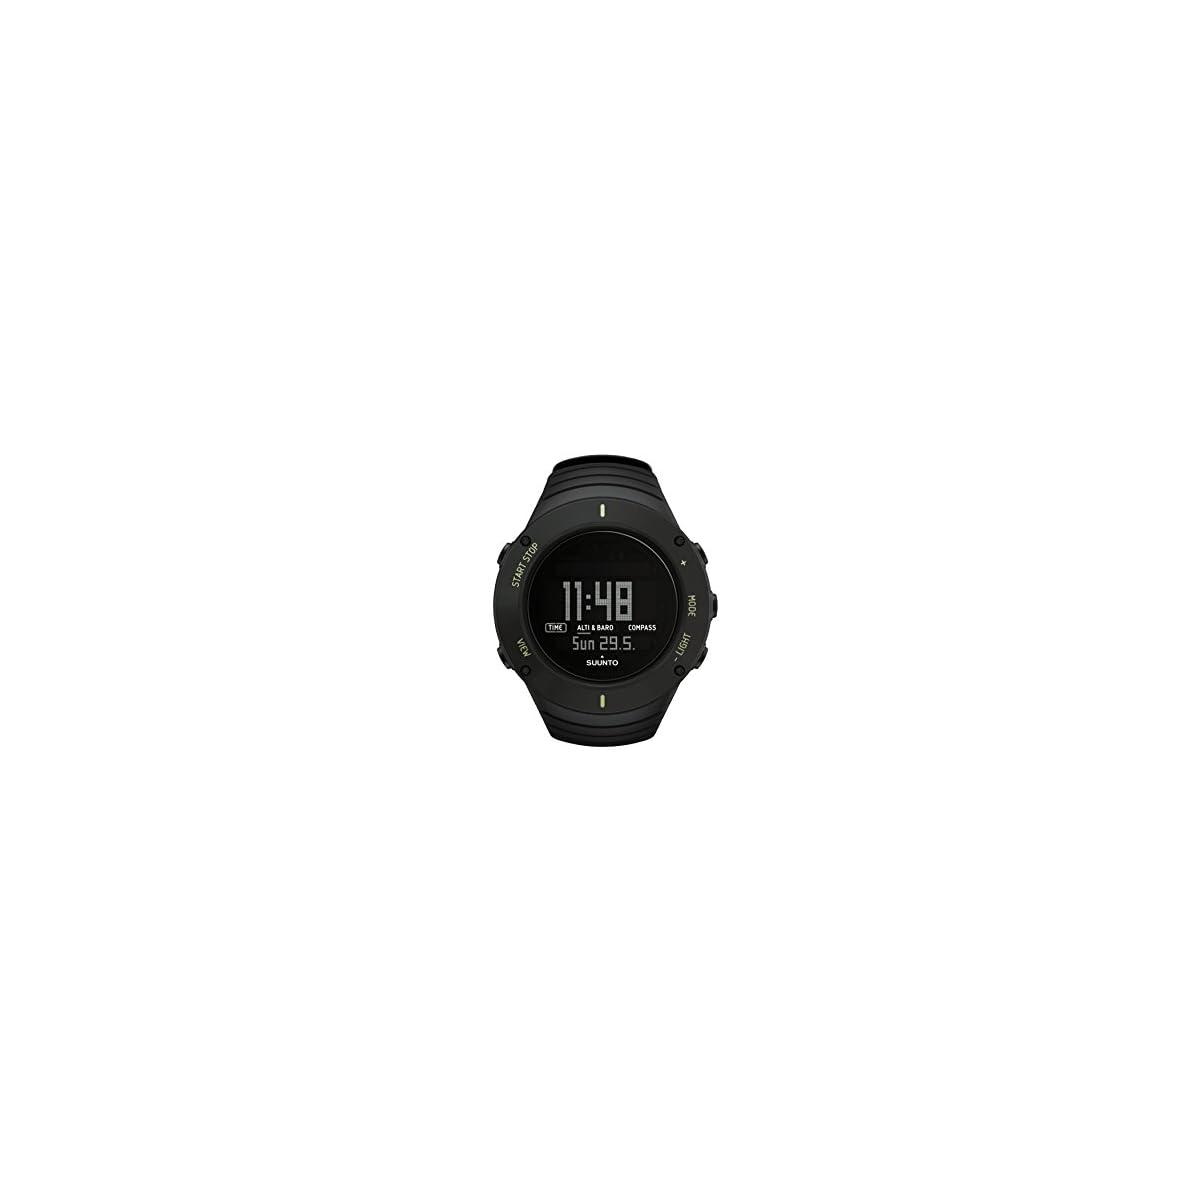 3134CpgAeOL. SS1200  - Suunto SS021371000 Core - Reloj de exterior para todas las altitudes, sumergible (30 m), con altímetro, barómetro, Negro (Ultimate Black)